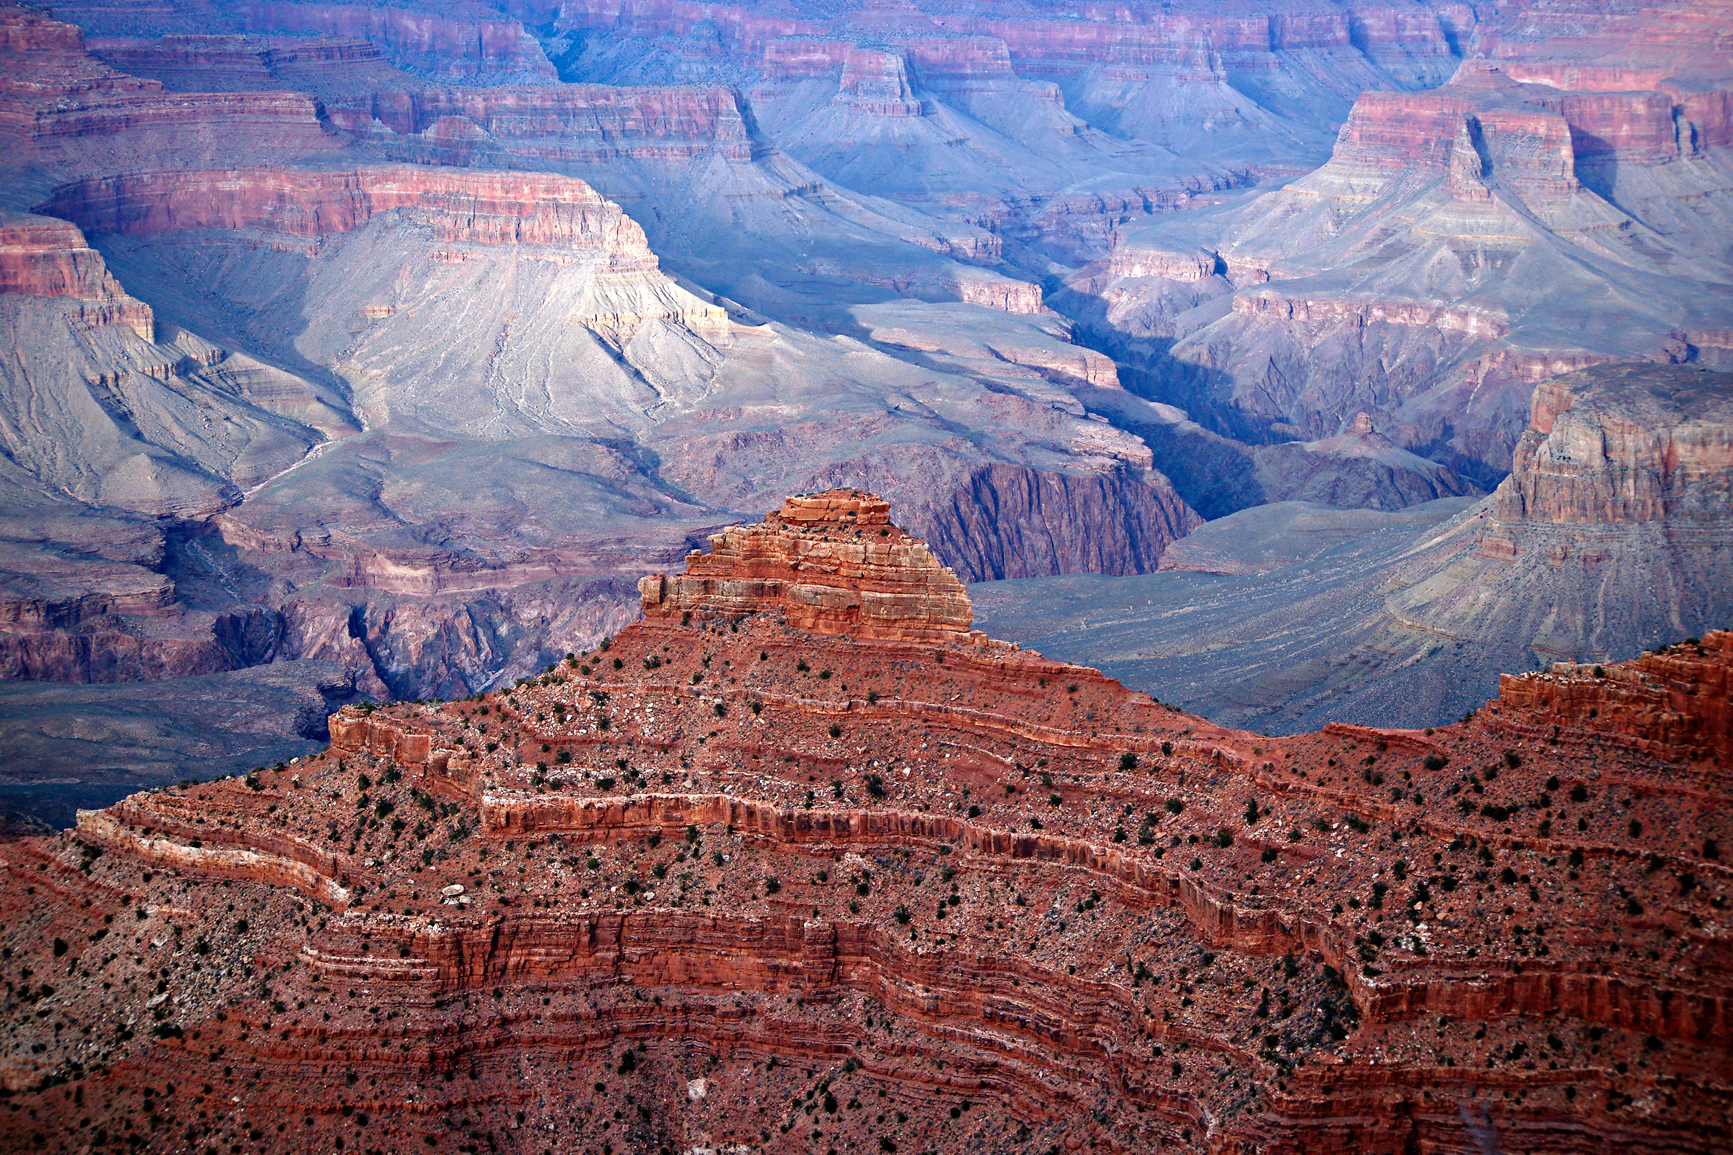 Grand canyon evening ridge photo